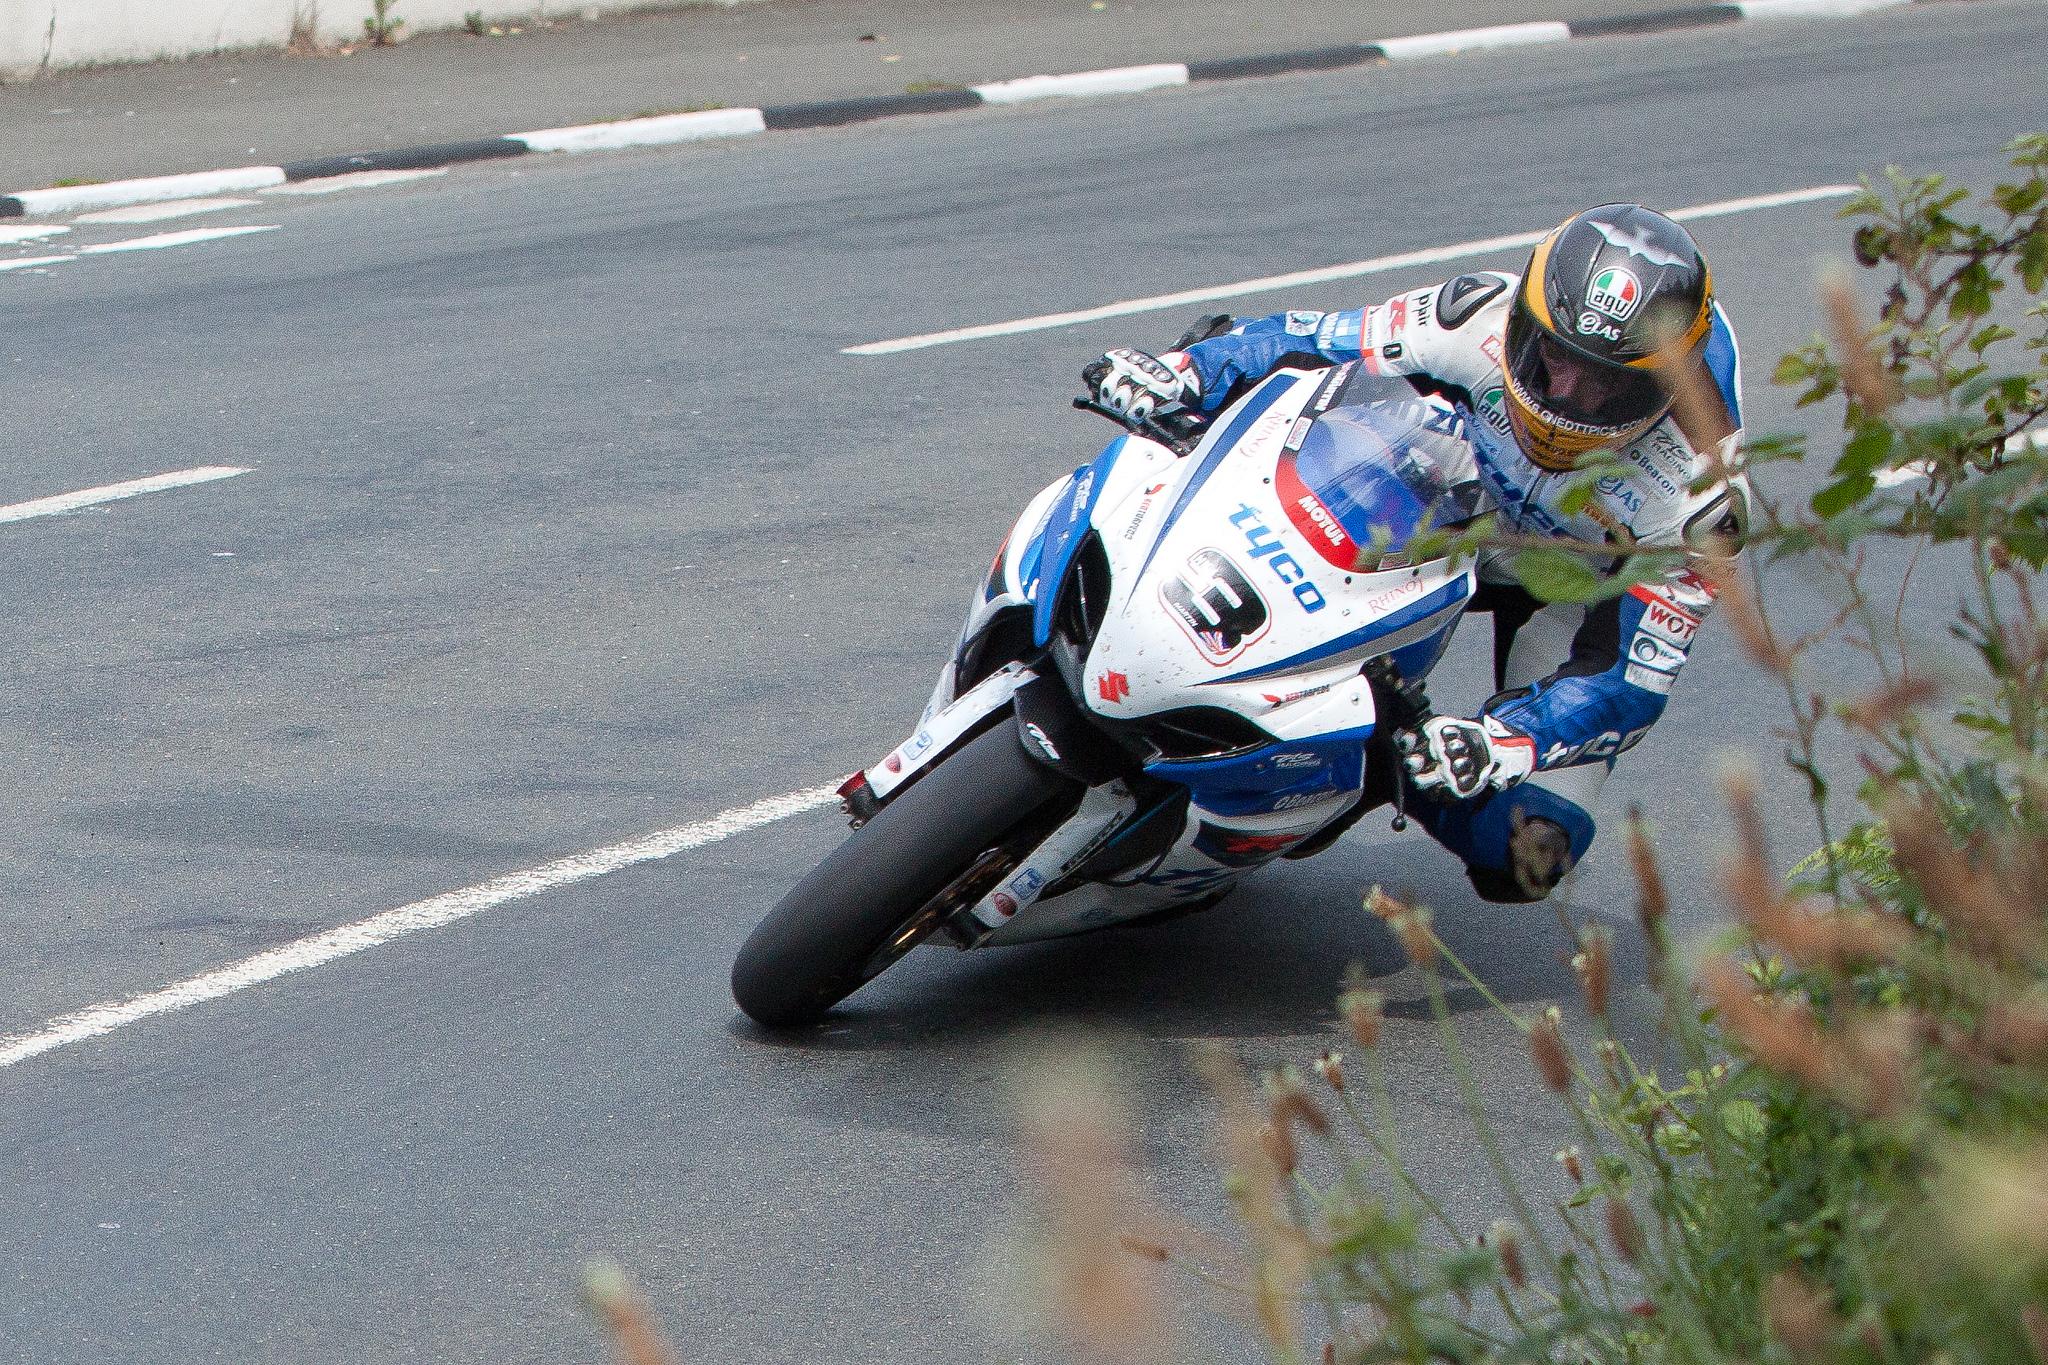 Guy Martin TT 2012 image credit Phil Long on flickr